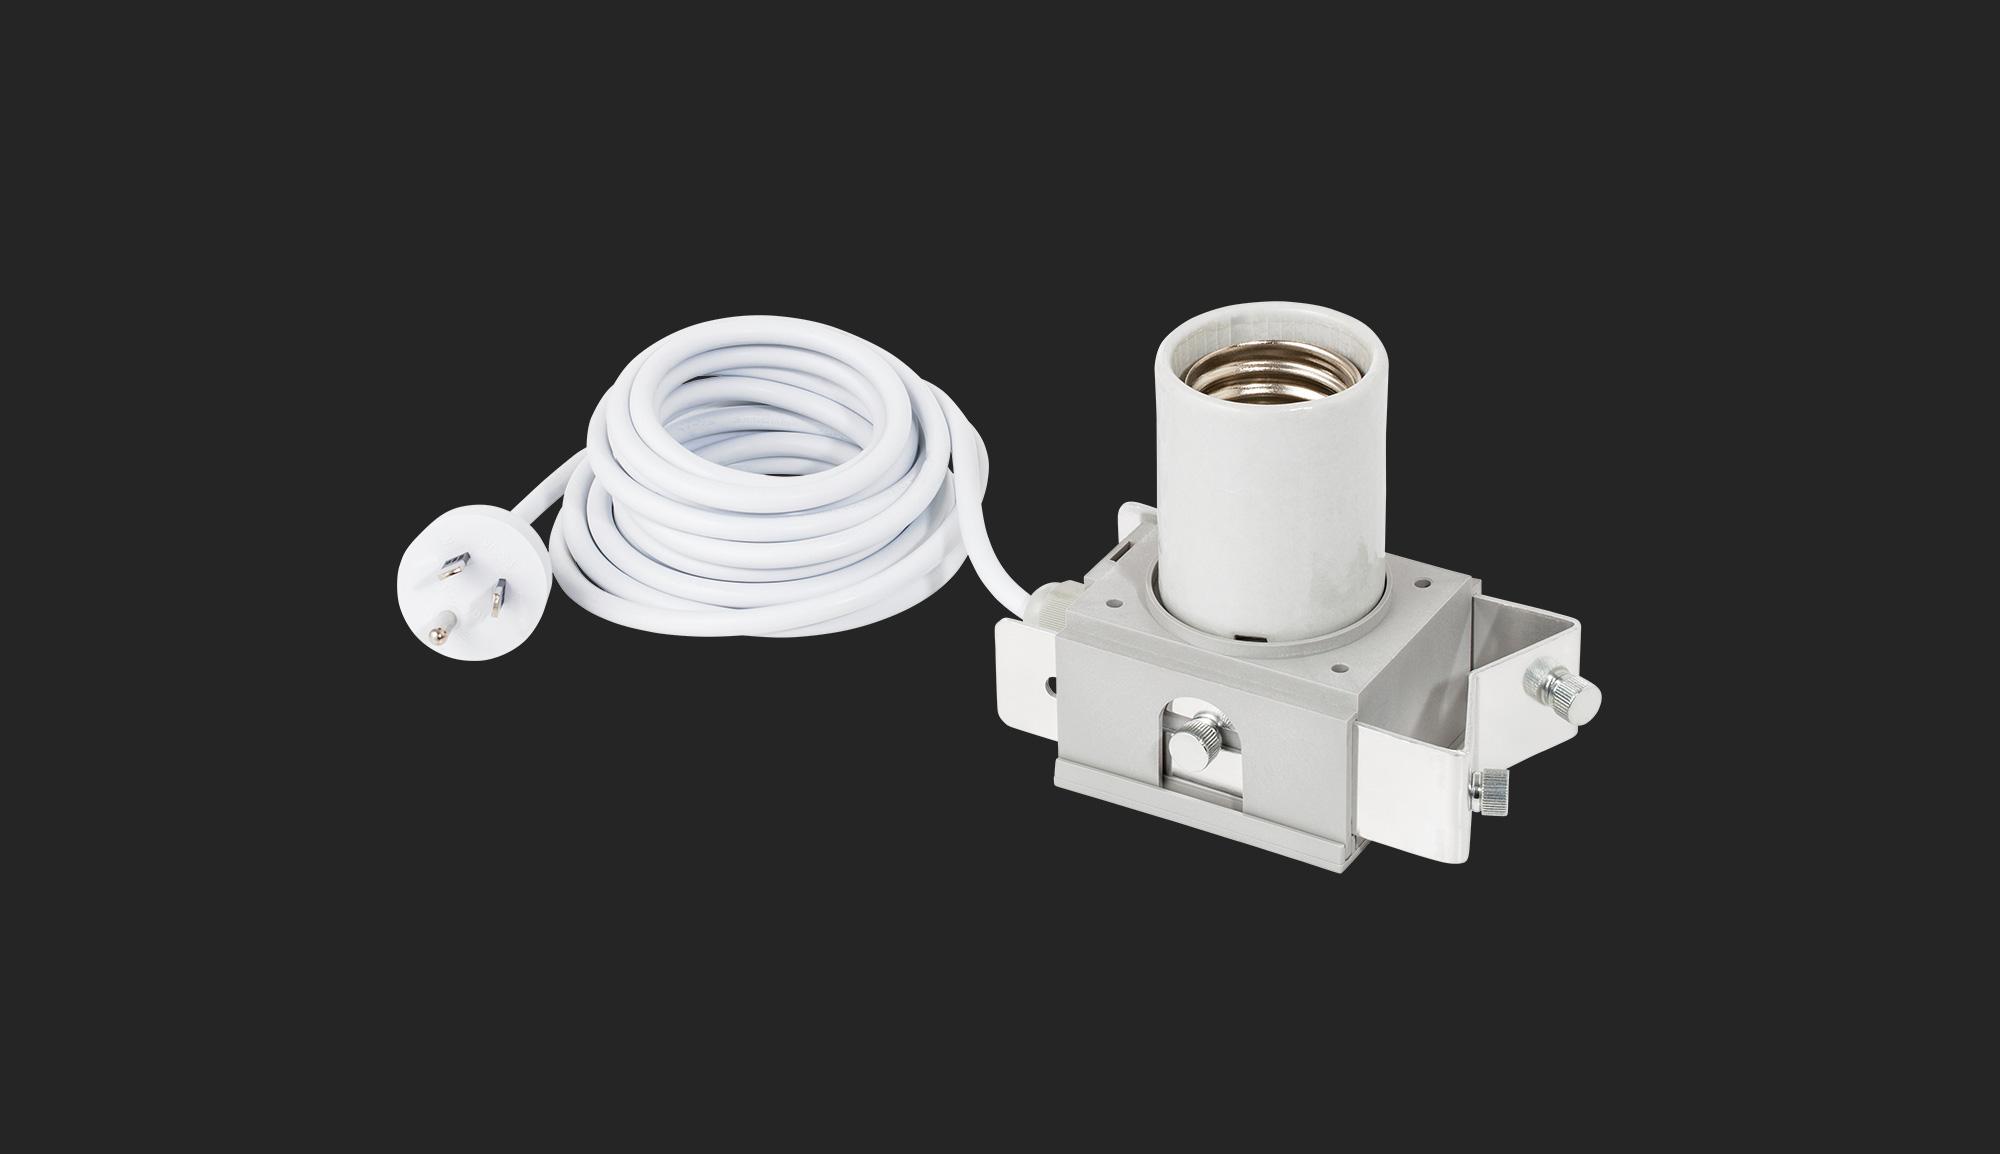 E40 Lamp Holder Australia - Adjust-A-Wings